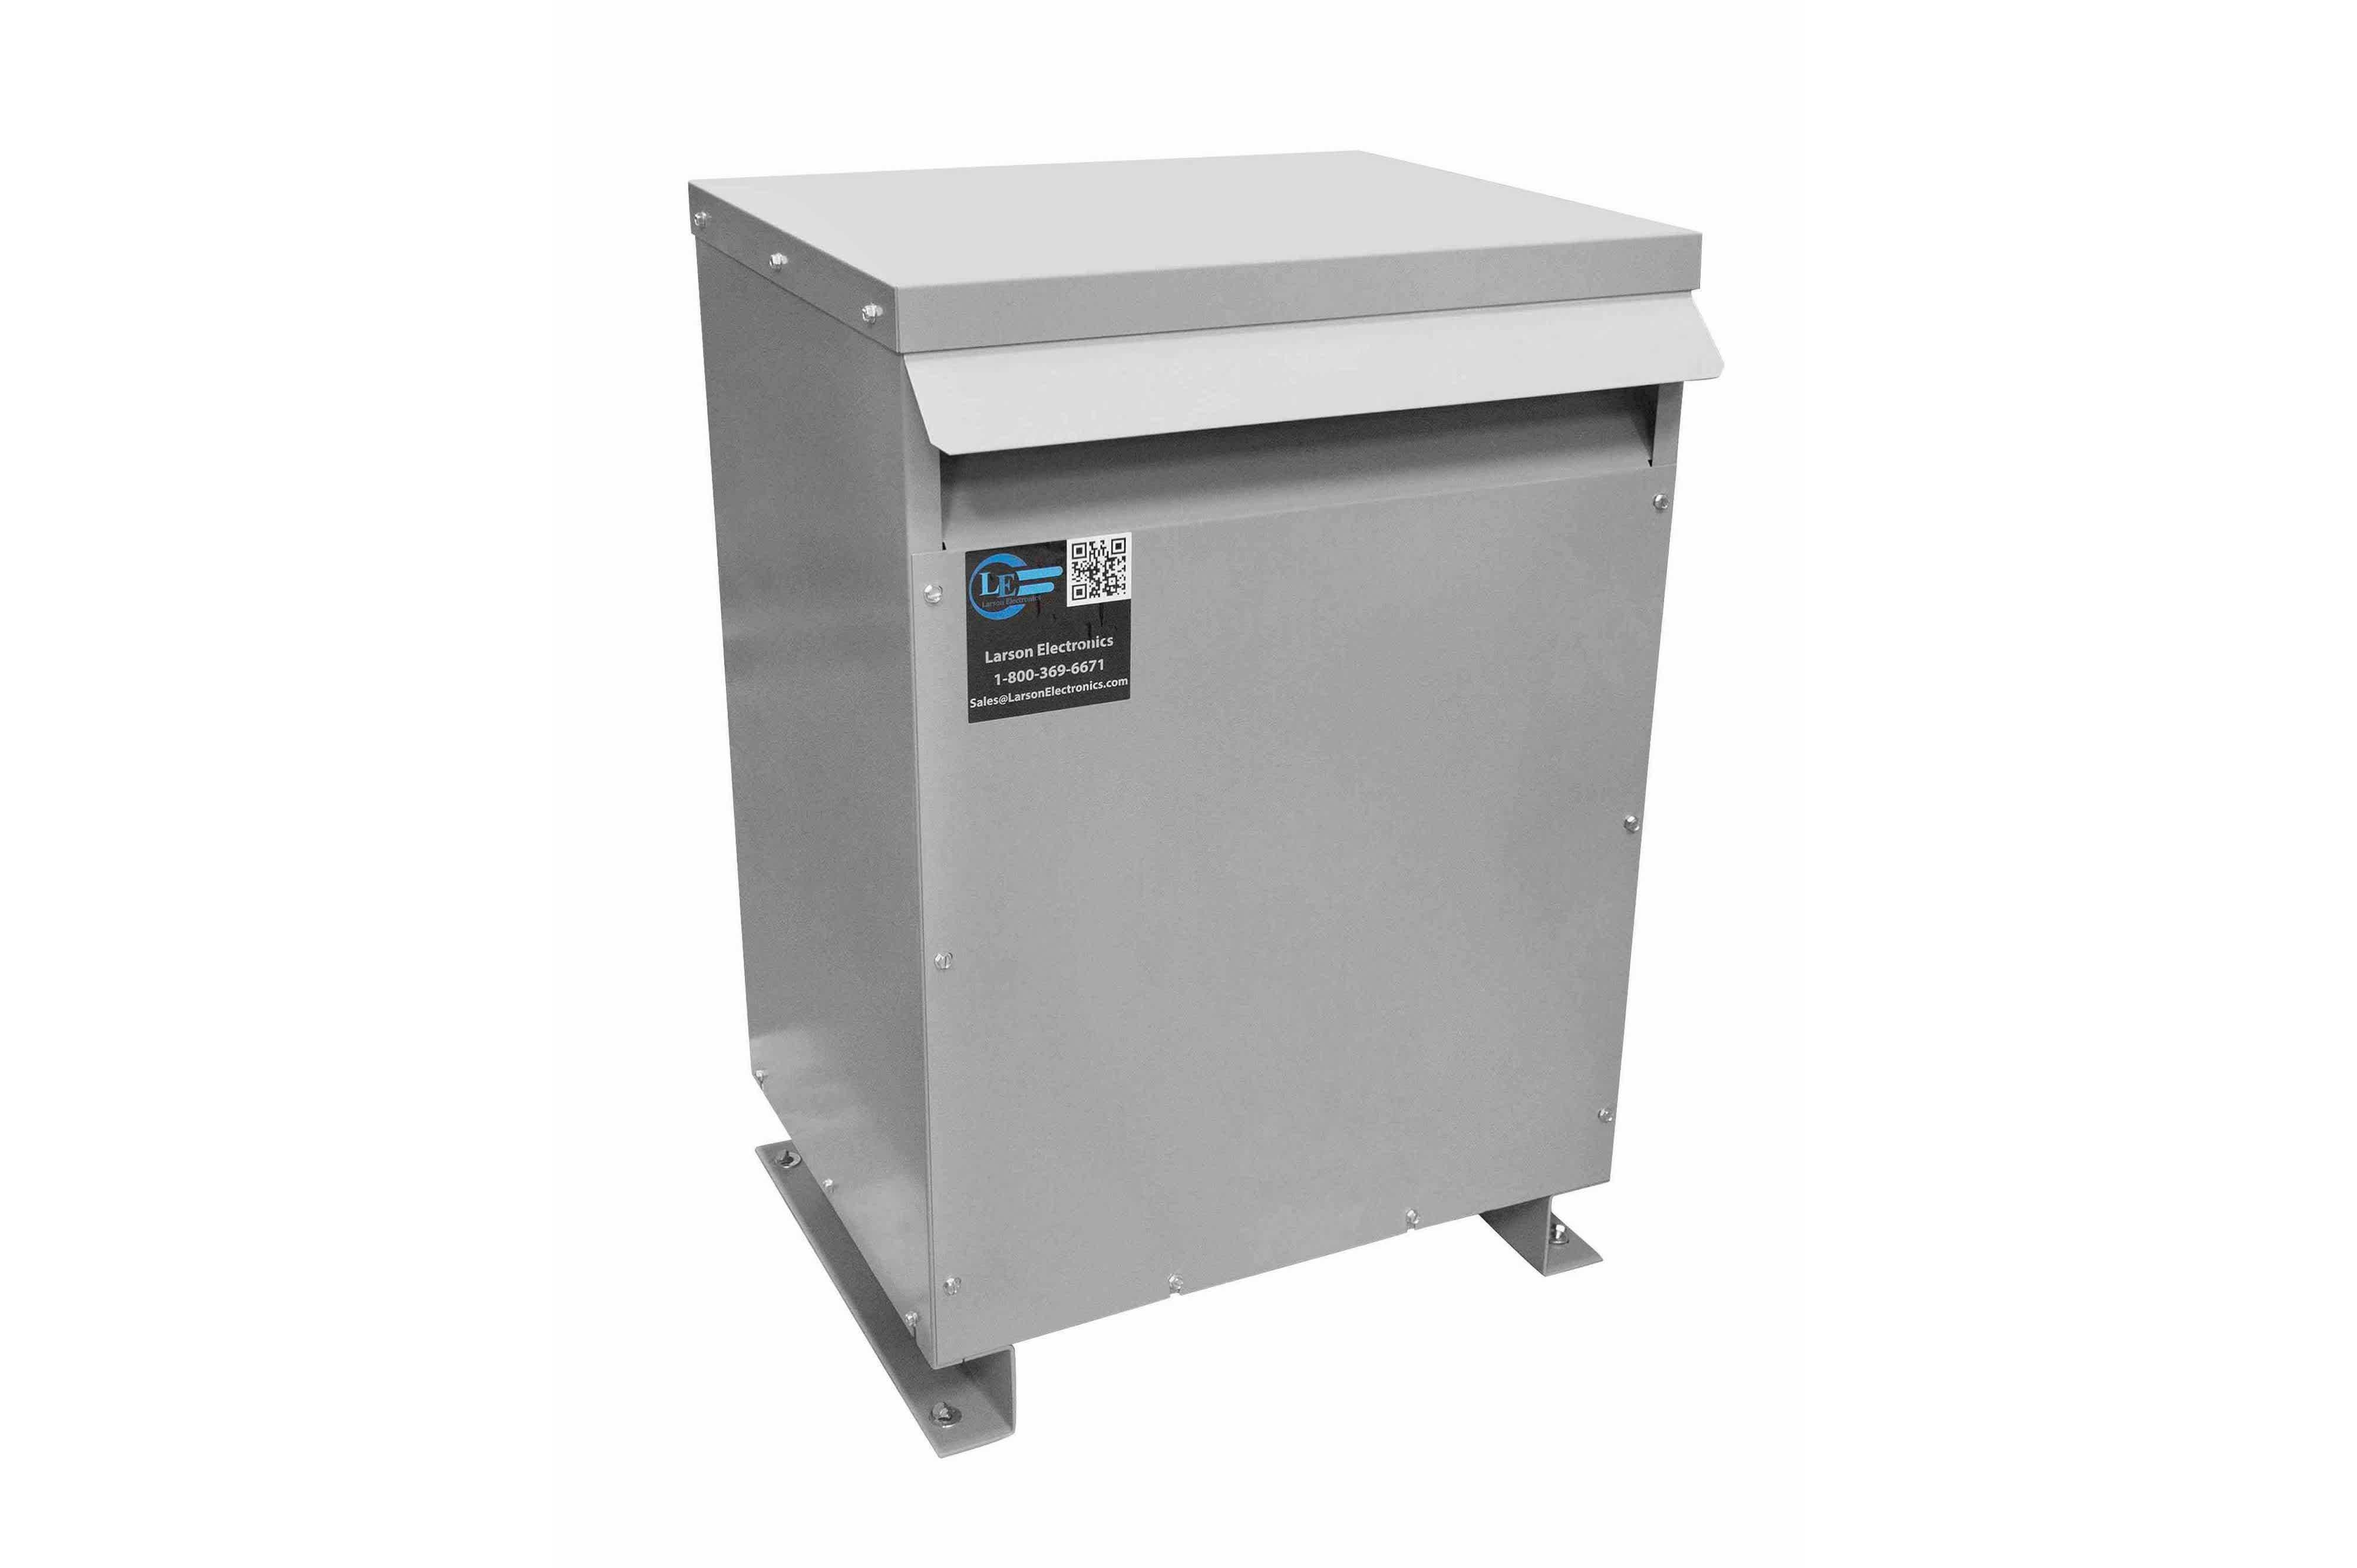 225 kVA 3PH DOE Transformer, 230V Delta Primary, 208Y/120 Wye-N Secondary, N3R, Ventilated, 60 Hz